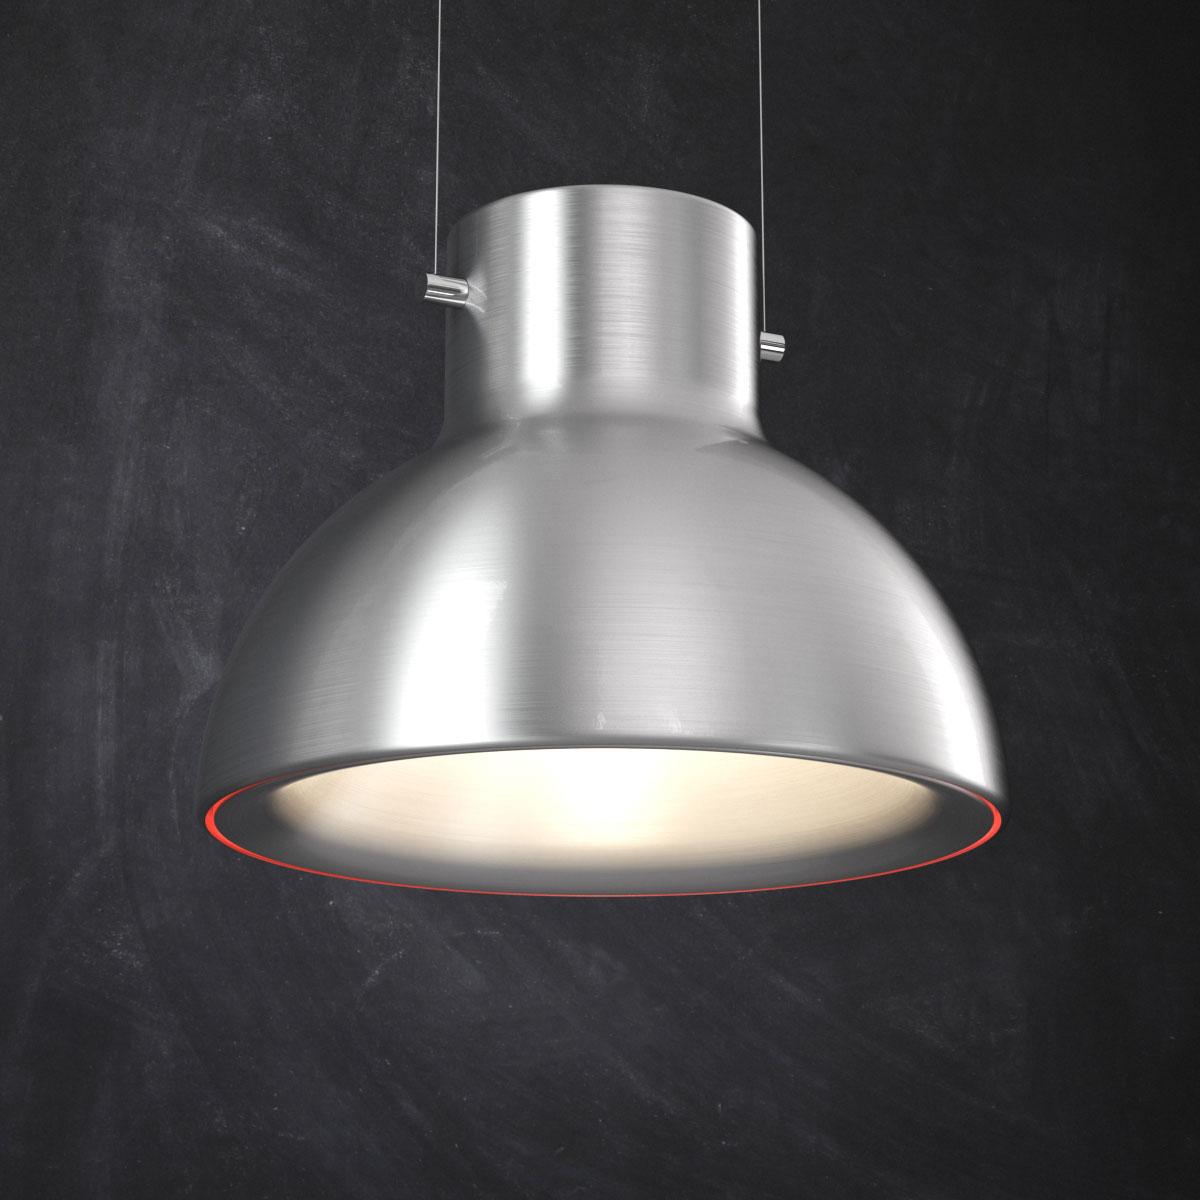 lamp 16 AM152 Archmodels